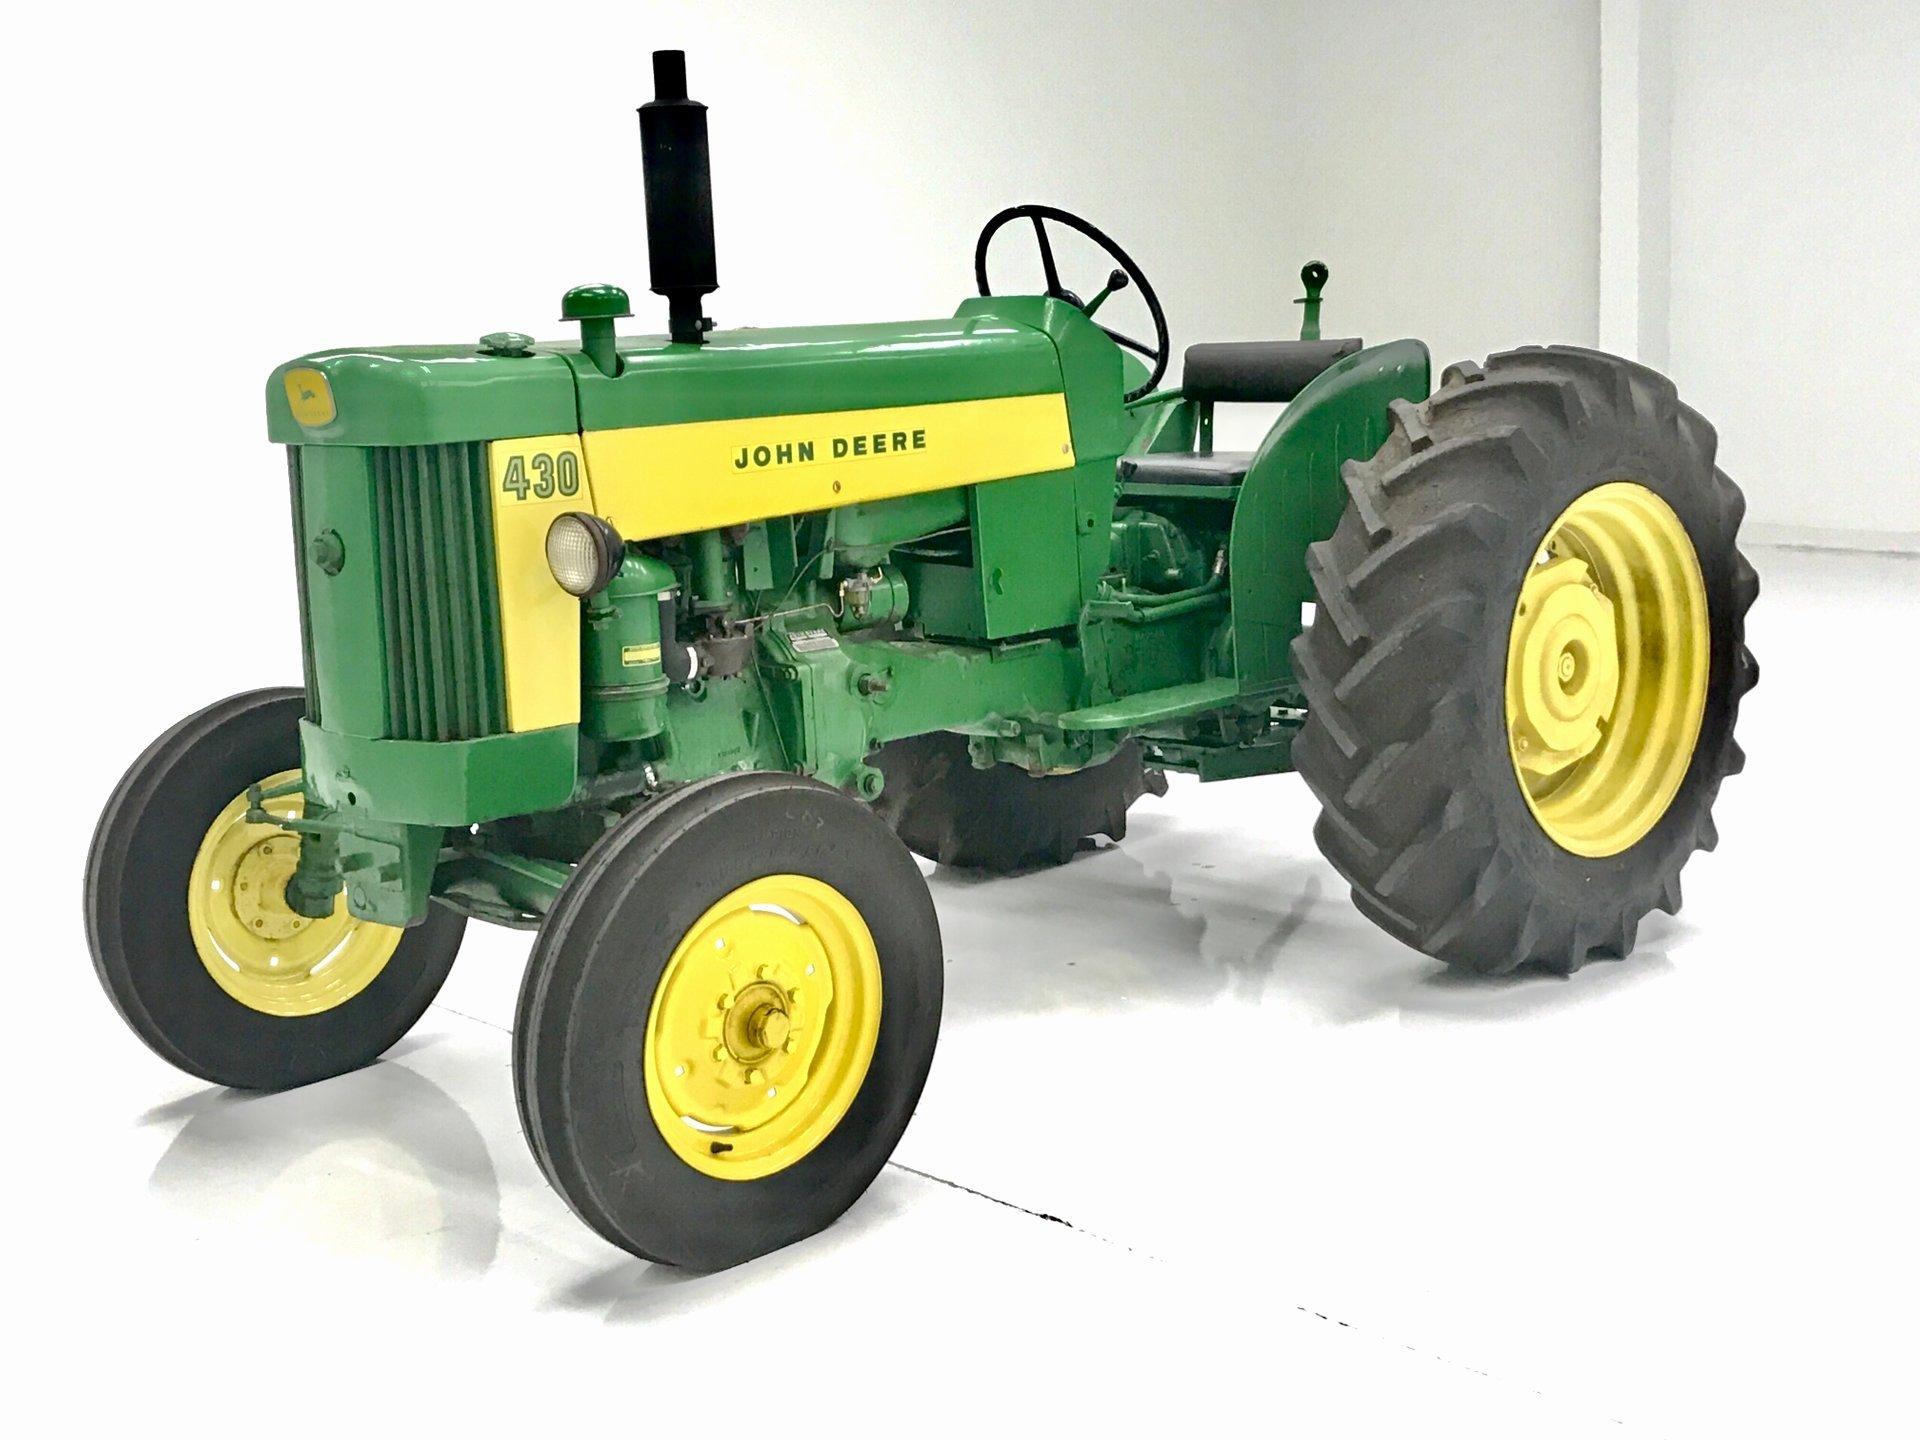 Farm Equipment Bill Of Sale Elegant 1959 John Deere 430 U Tractor